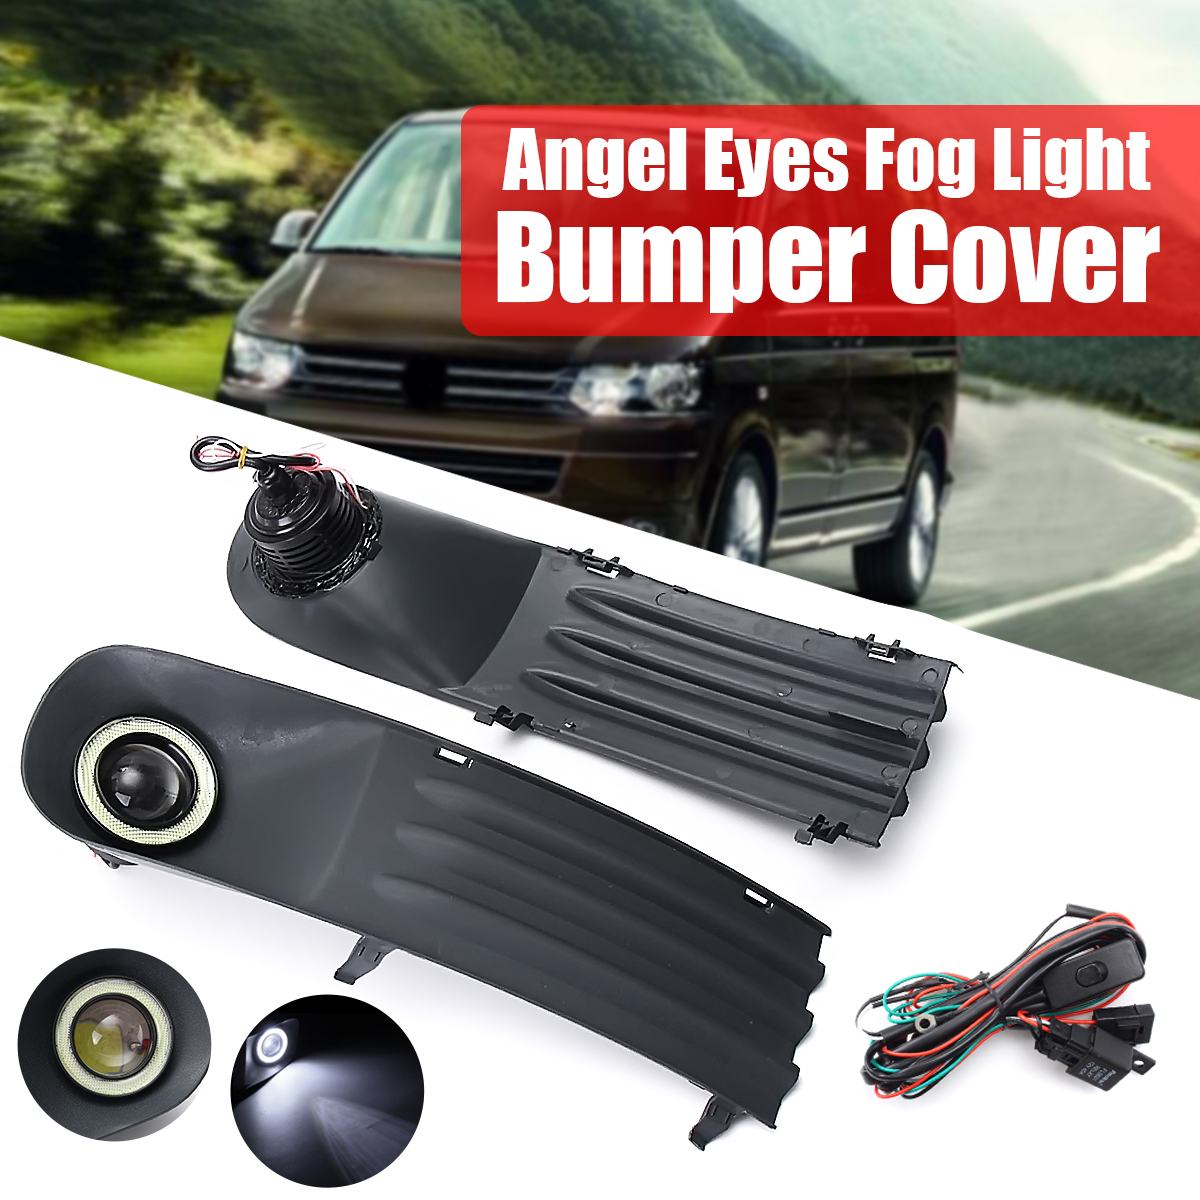 [WRG7447] Angel Eyes Wiring Harness Kit